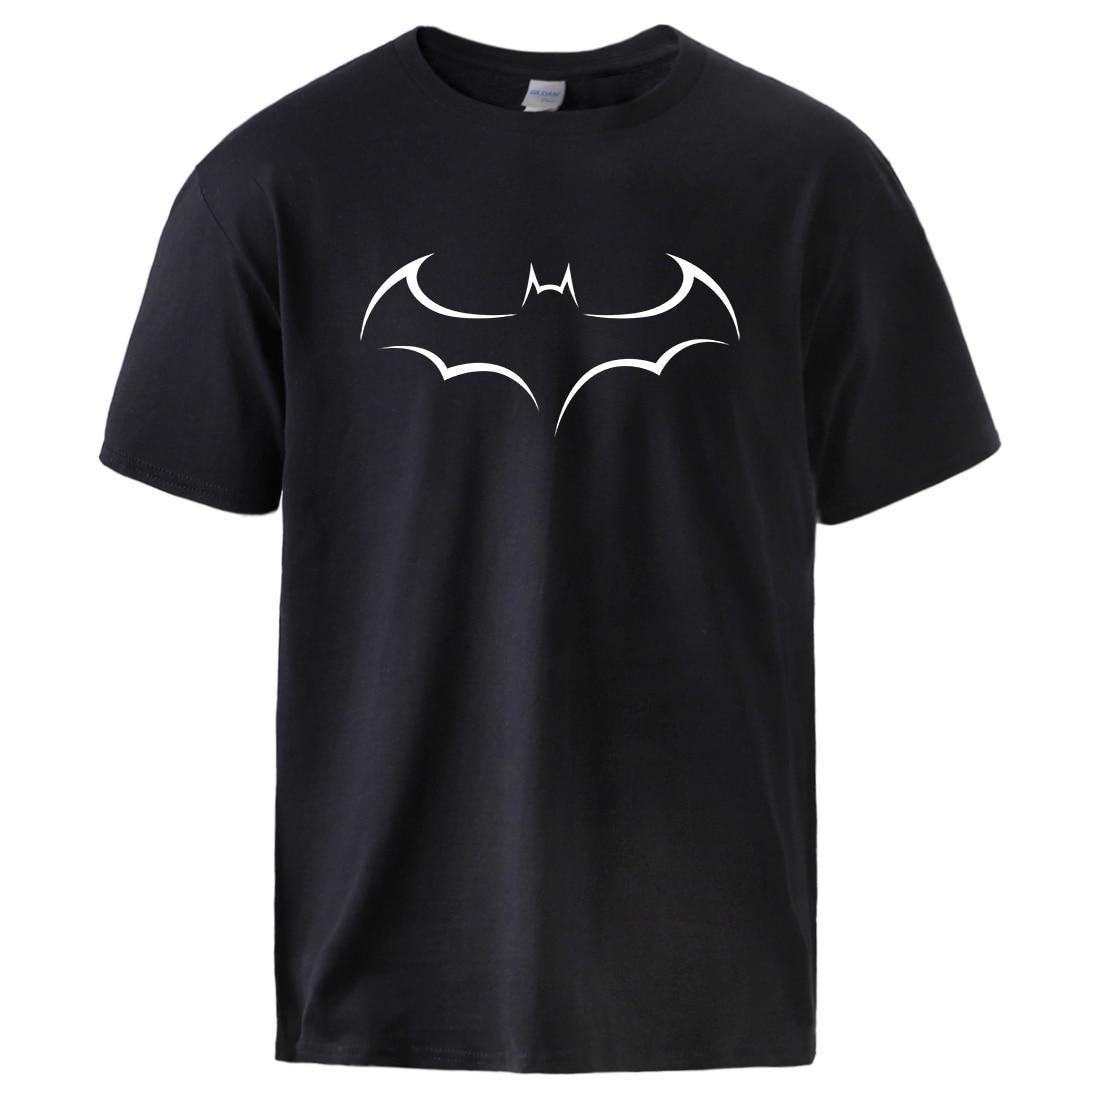 Man Movie Batman Print T Shirts 2020 Summer Spring Cotton T Shirts Mens Casual Short Sleeve Pullover Sportswear Hip Hop Tees